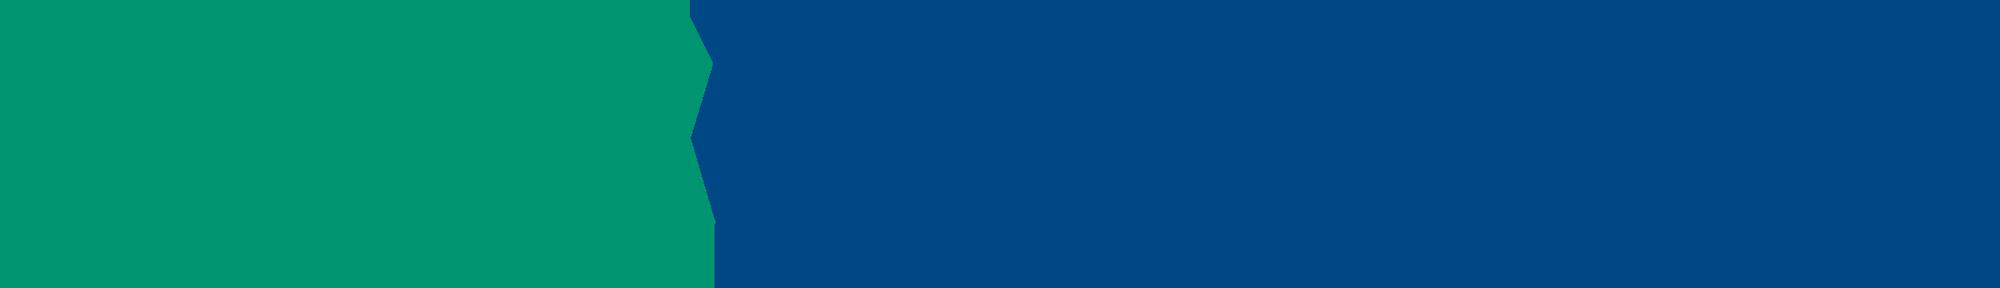 Intelesense logo identity design Wolverhampton